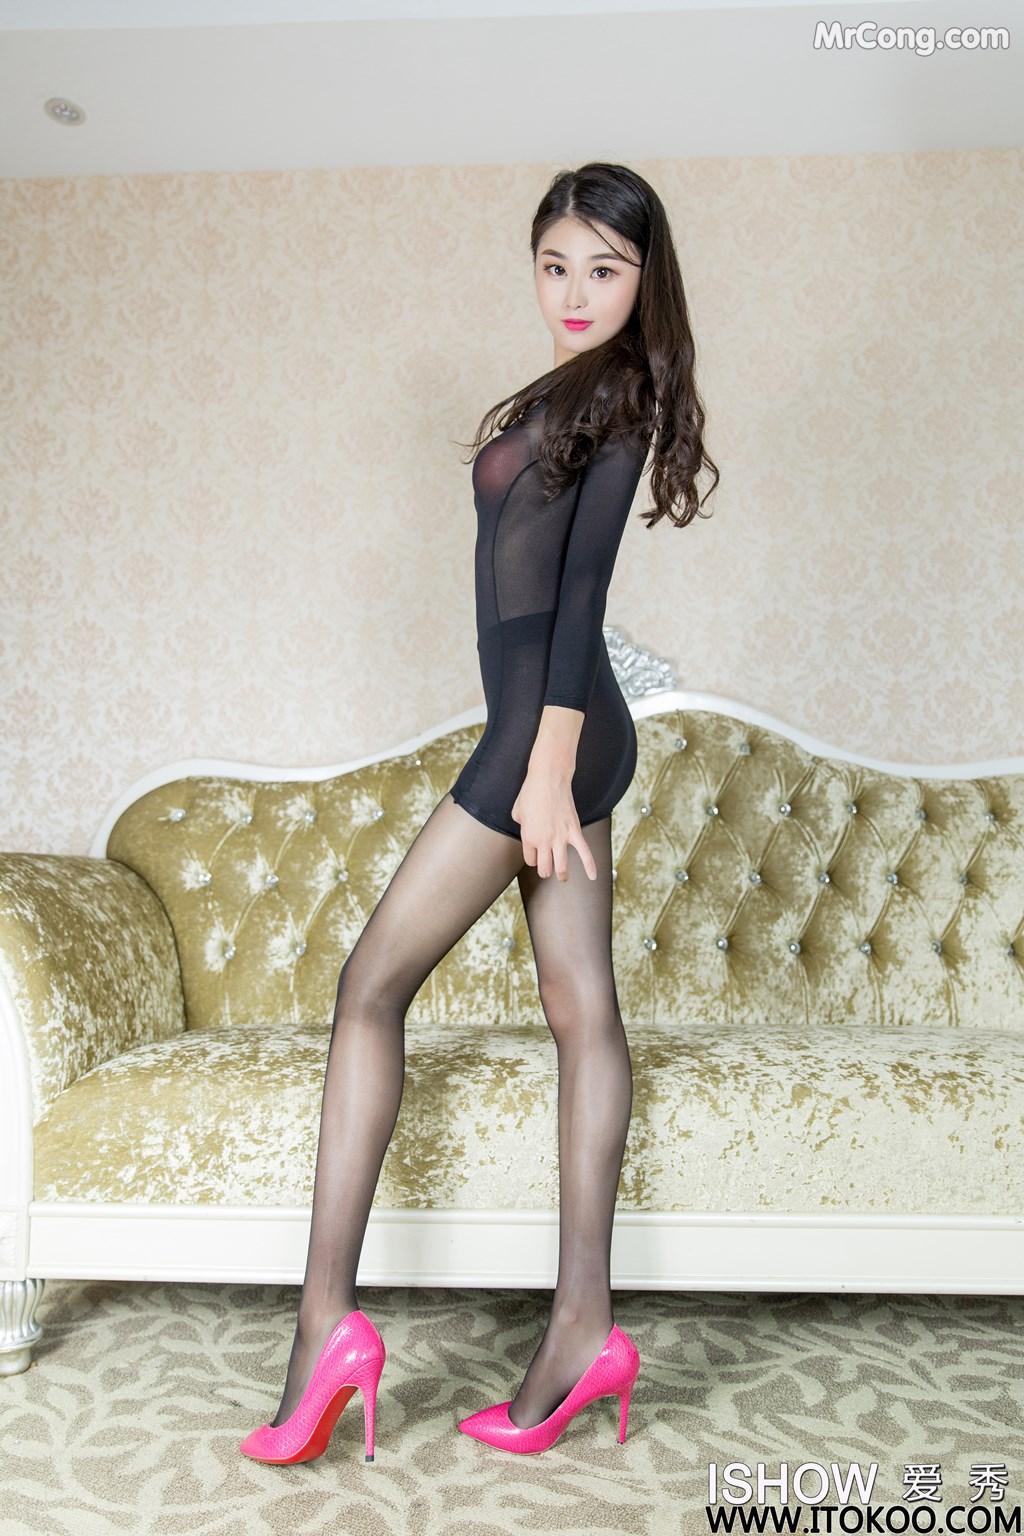 Image ISHOW-No.147-Liu-Yue-Fei-Phoebe-MrCong.com-005 in post ISHOW No.147: Người mẫu Liu Yue Fei (刘玥菲Phoebe) (33 ảnh)